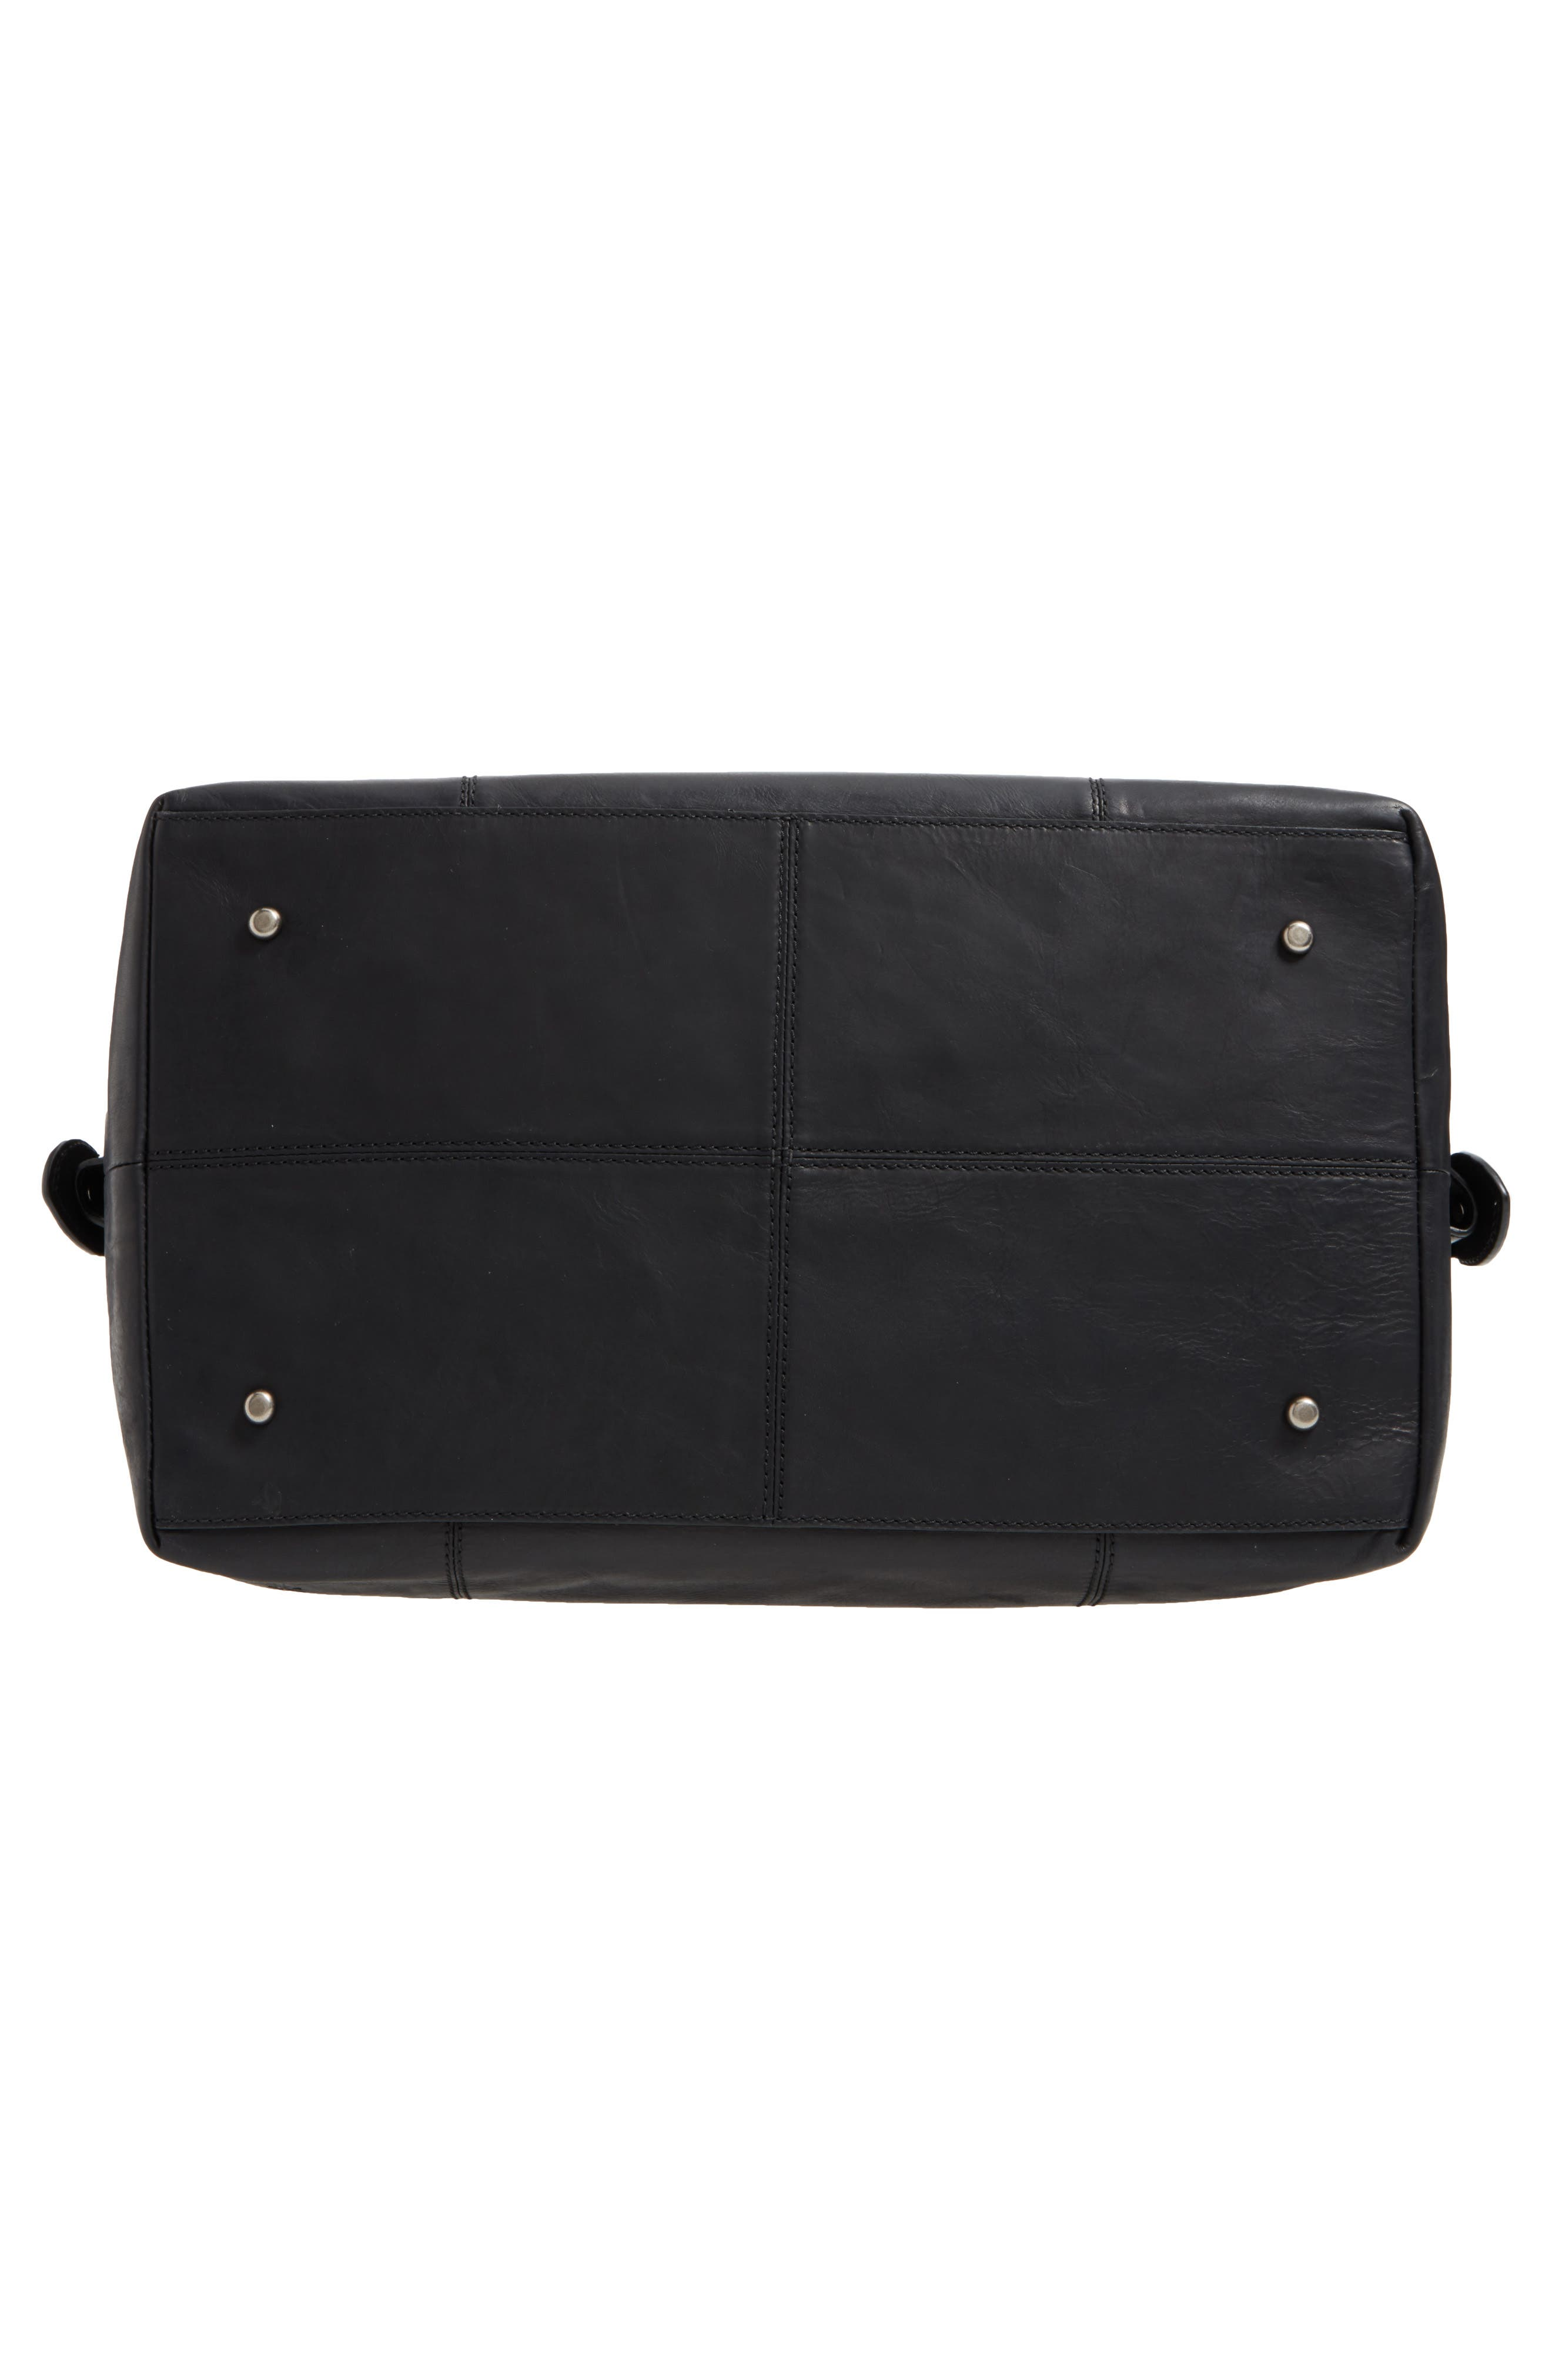 'Logan' Leather Overnight Bag,                             Alternate thumbnail 6, color,                             001